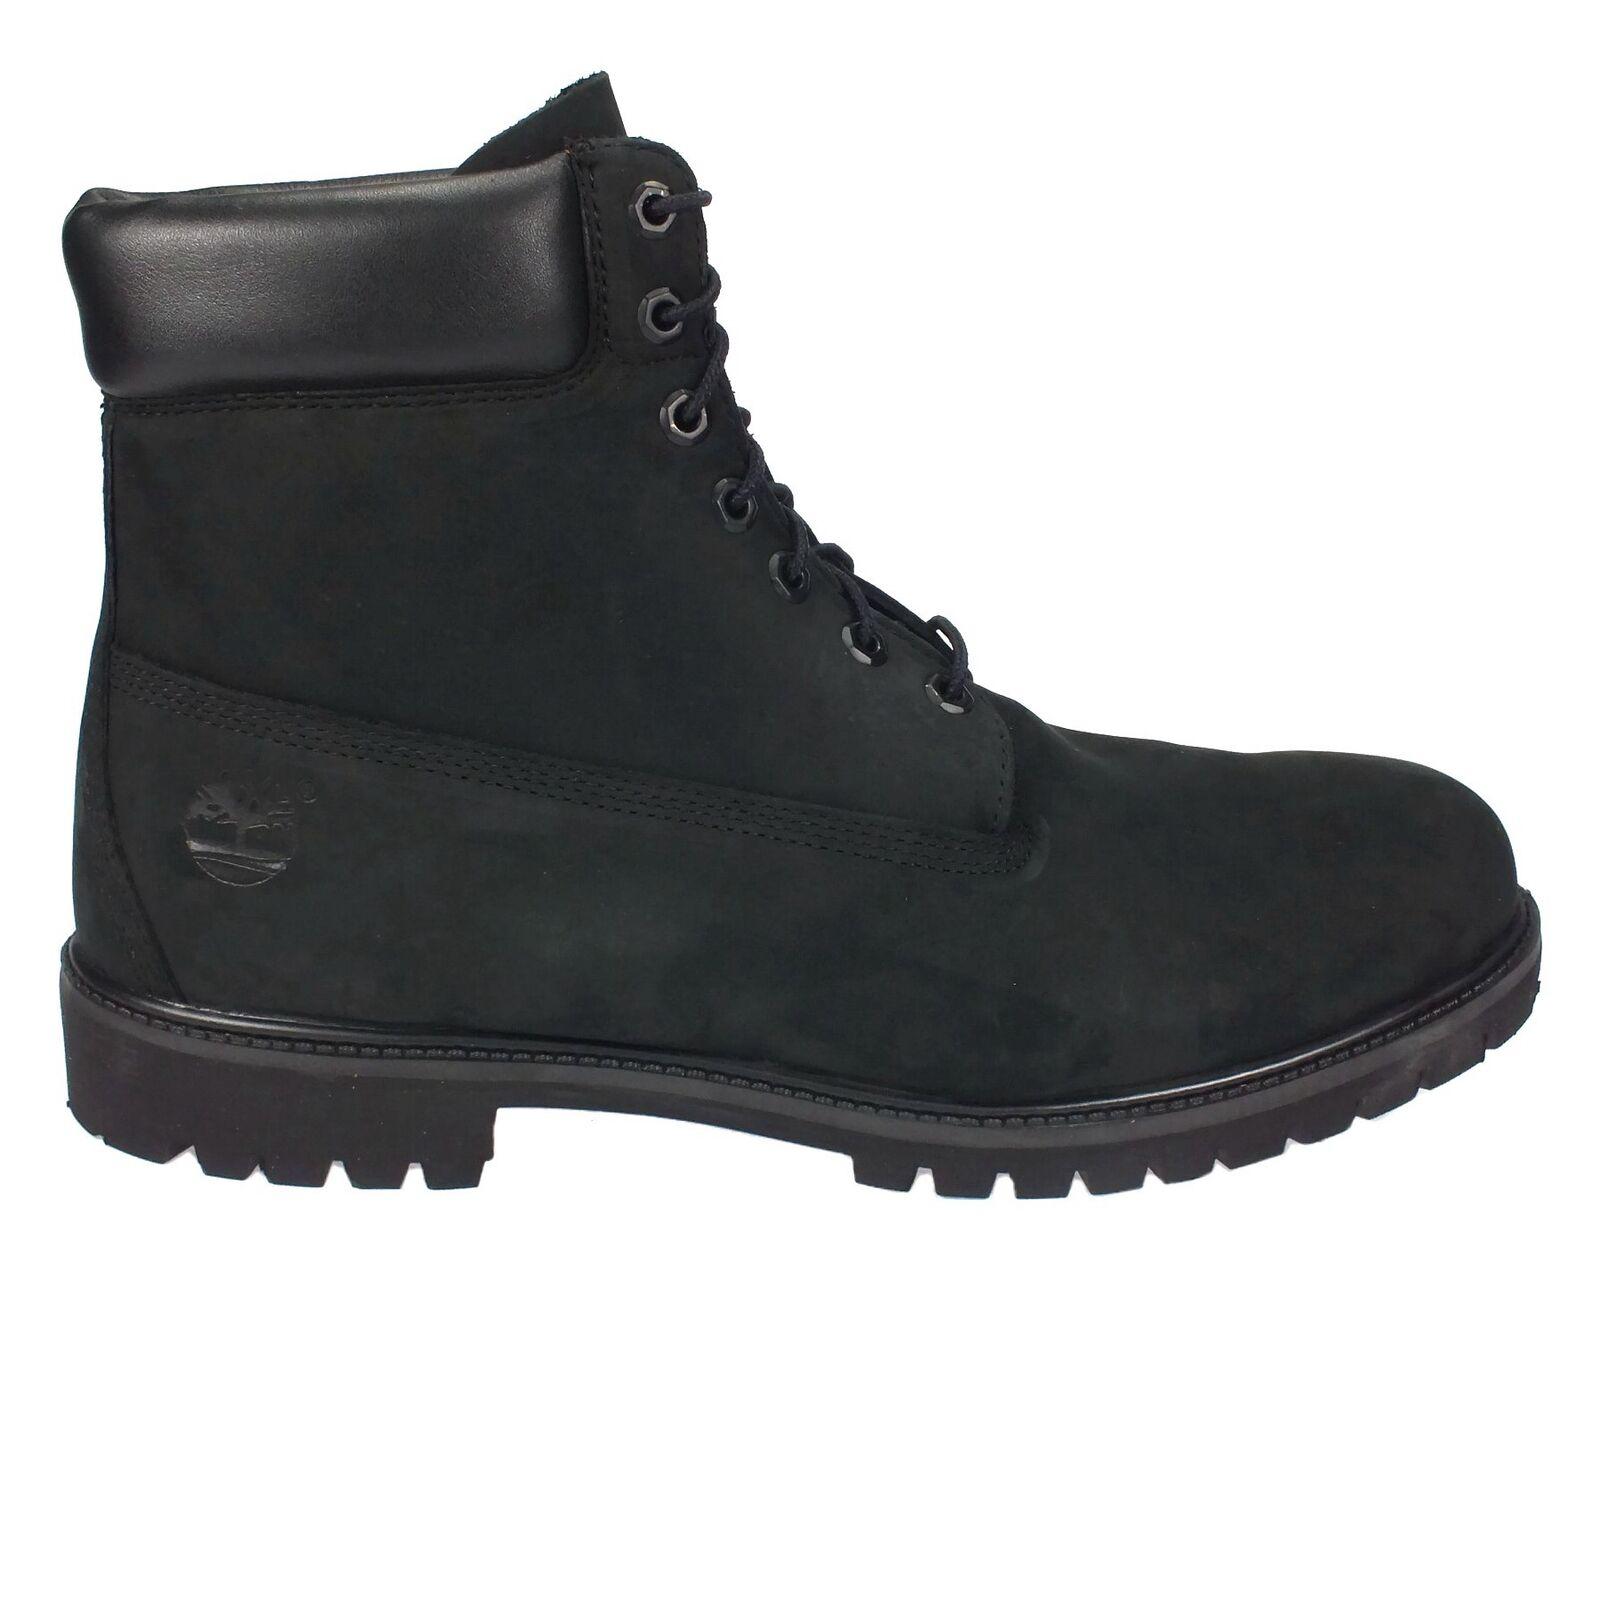 Timberland 6-Inch Premium Waterproof Stiefel Schuhe Schuhe Schuhe Stiefel Winterstiefel Herren  272032